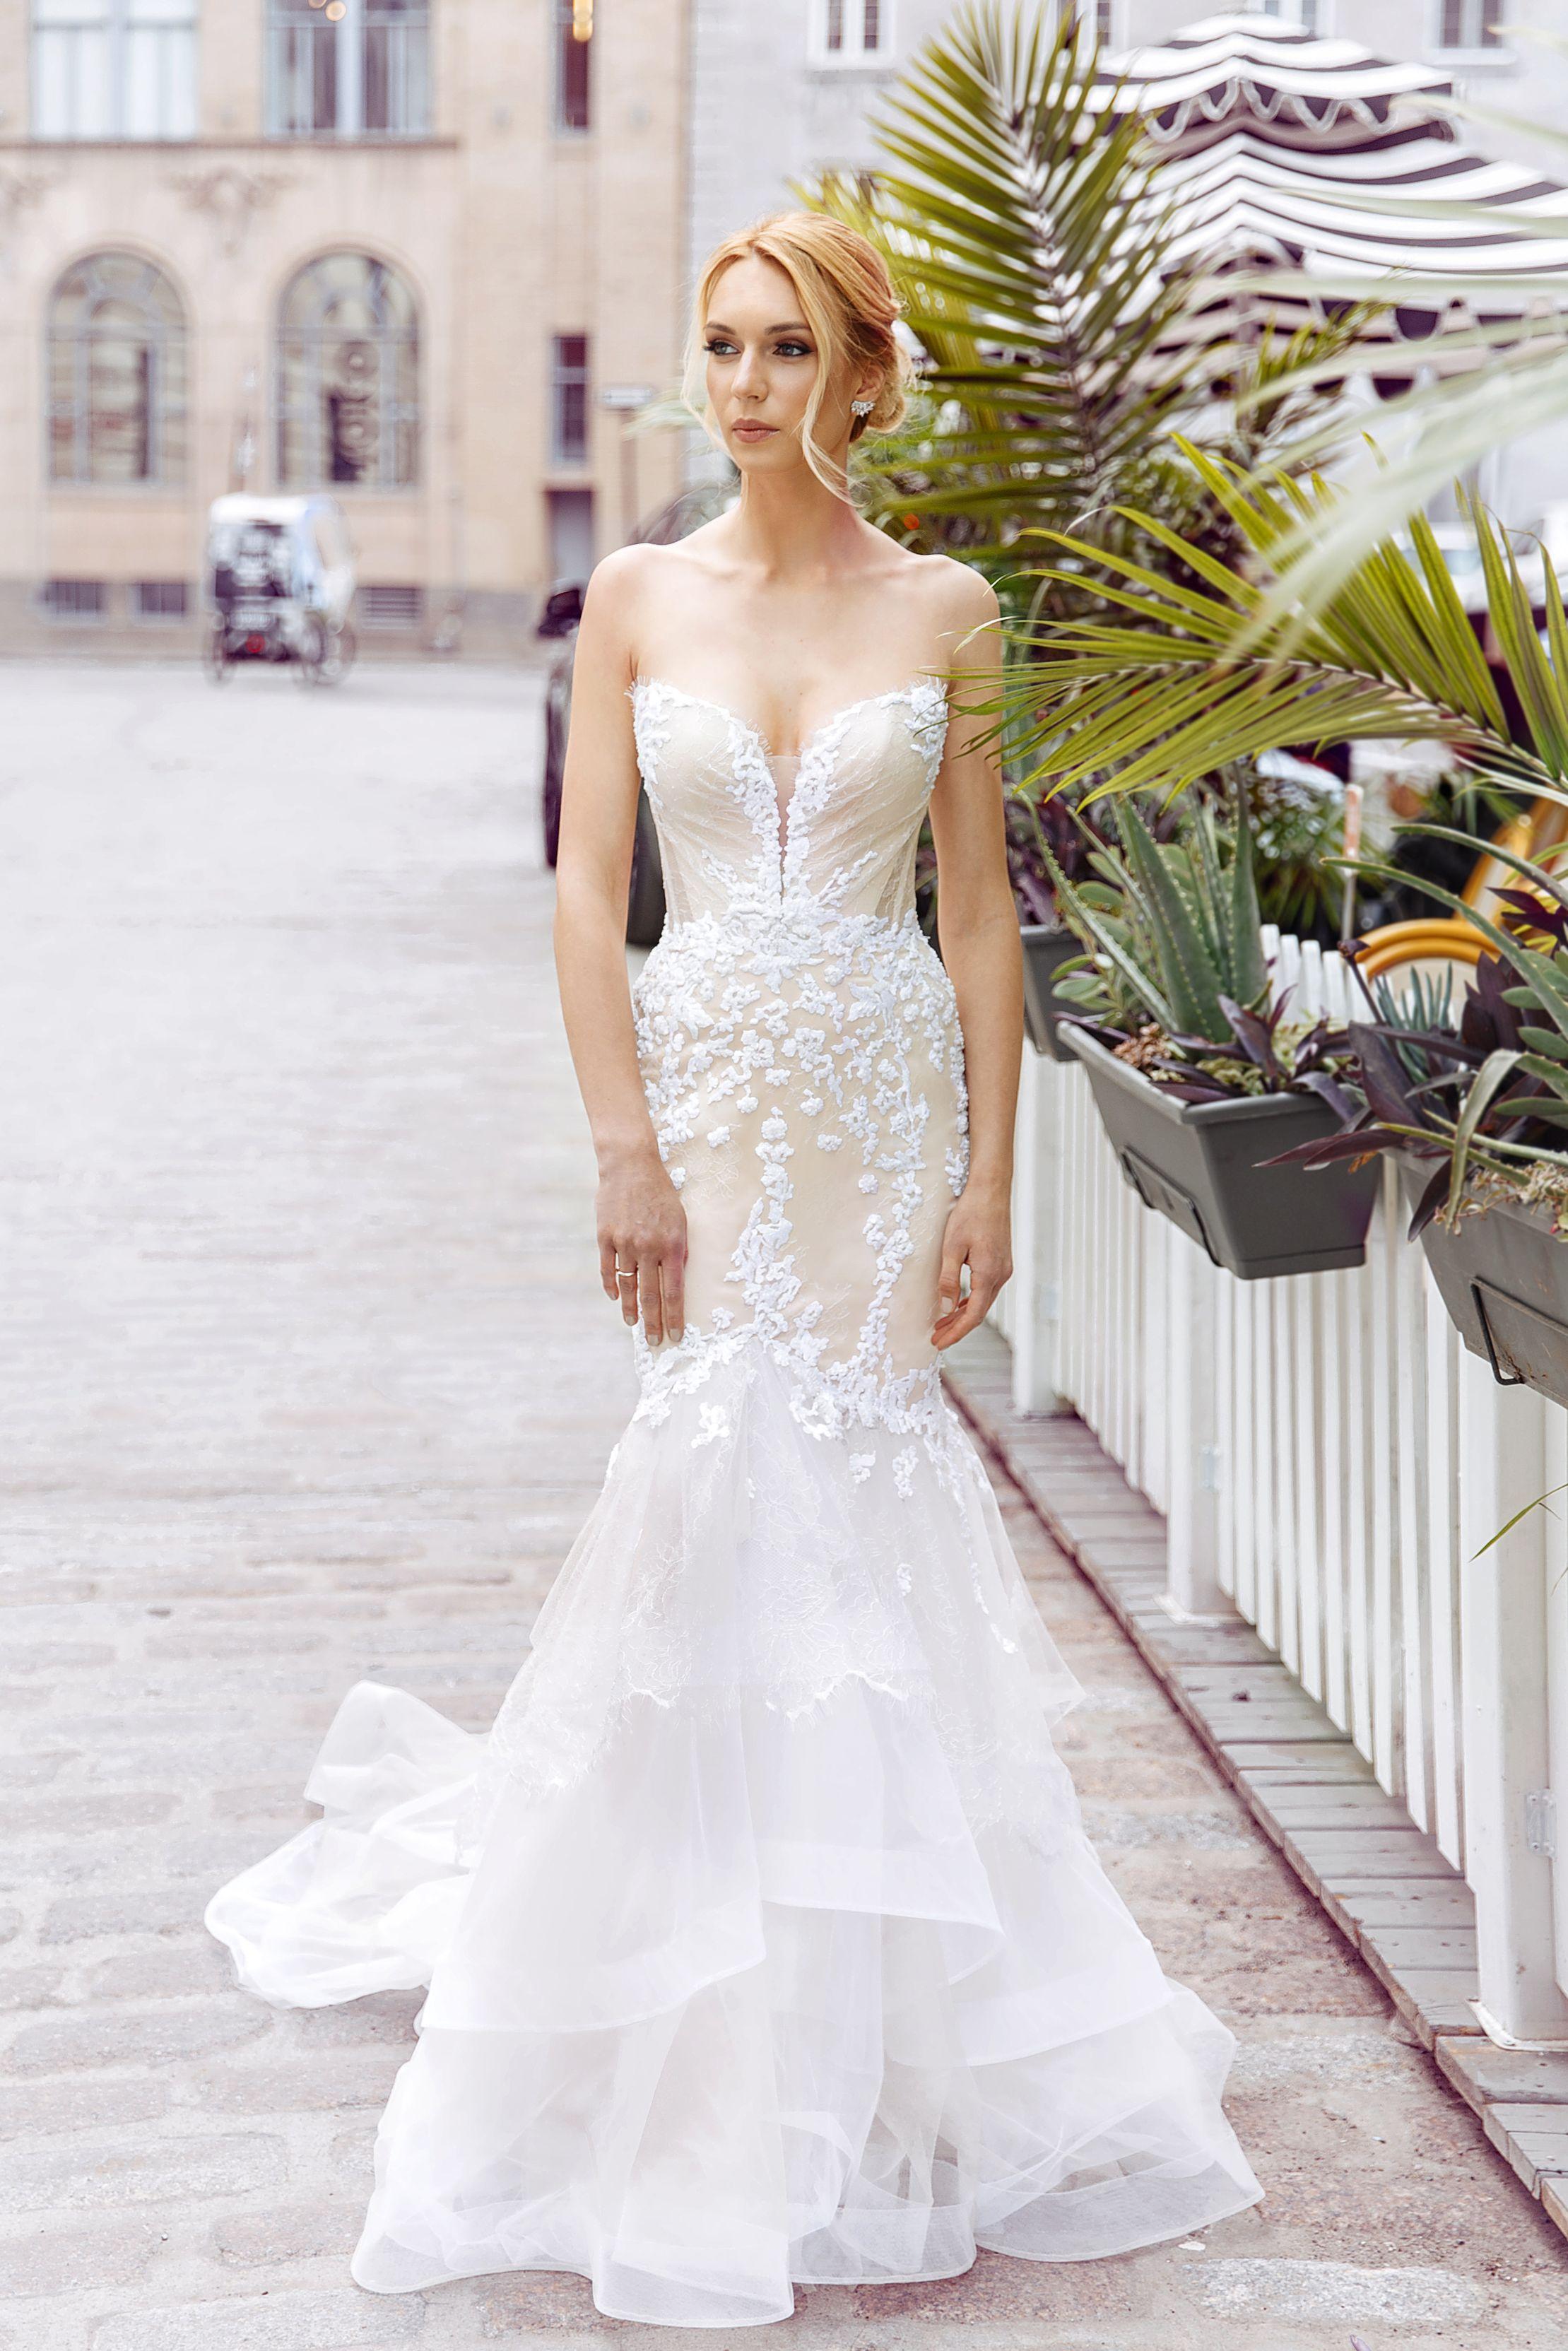 lilia haute couture robes de mariee haute gamme montreal